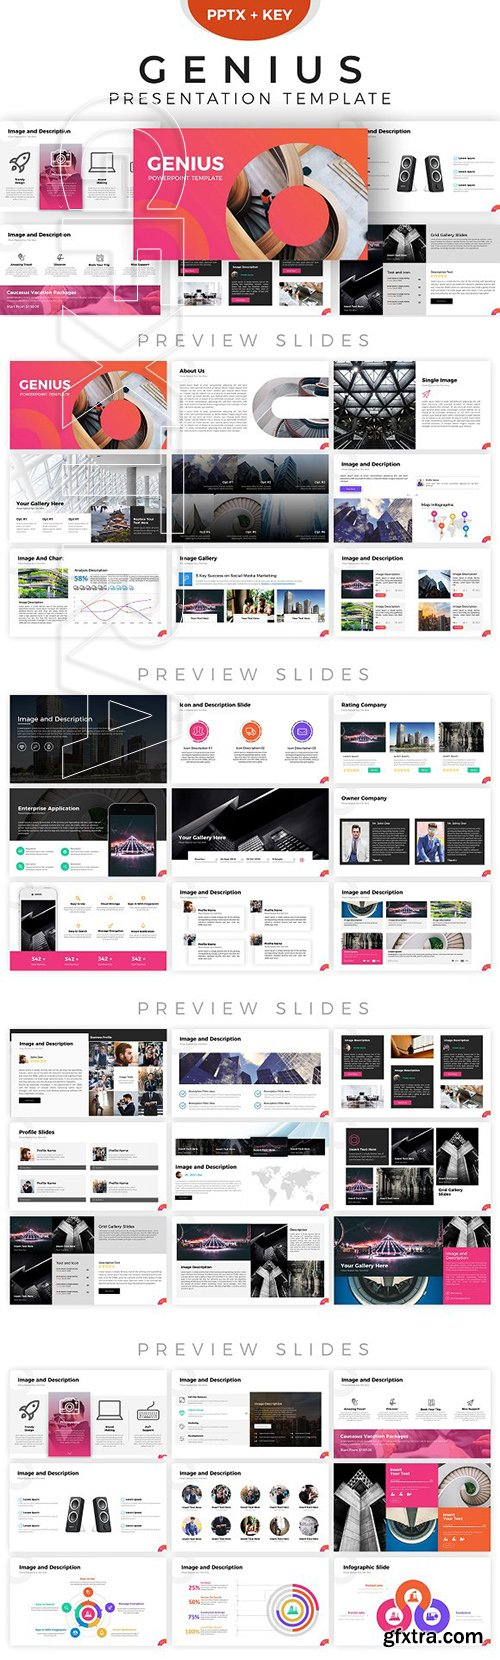 CreativeMarket - Genius Presentation Template 2844129